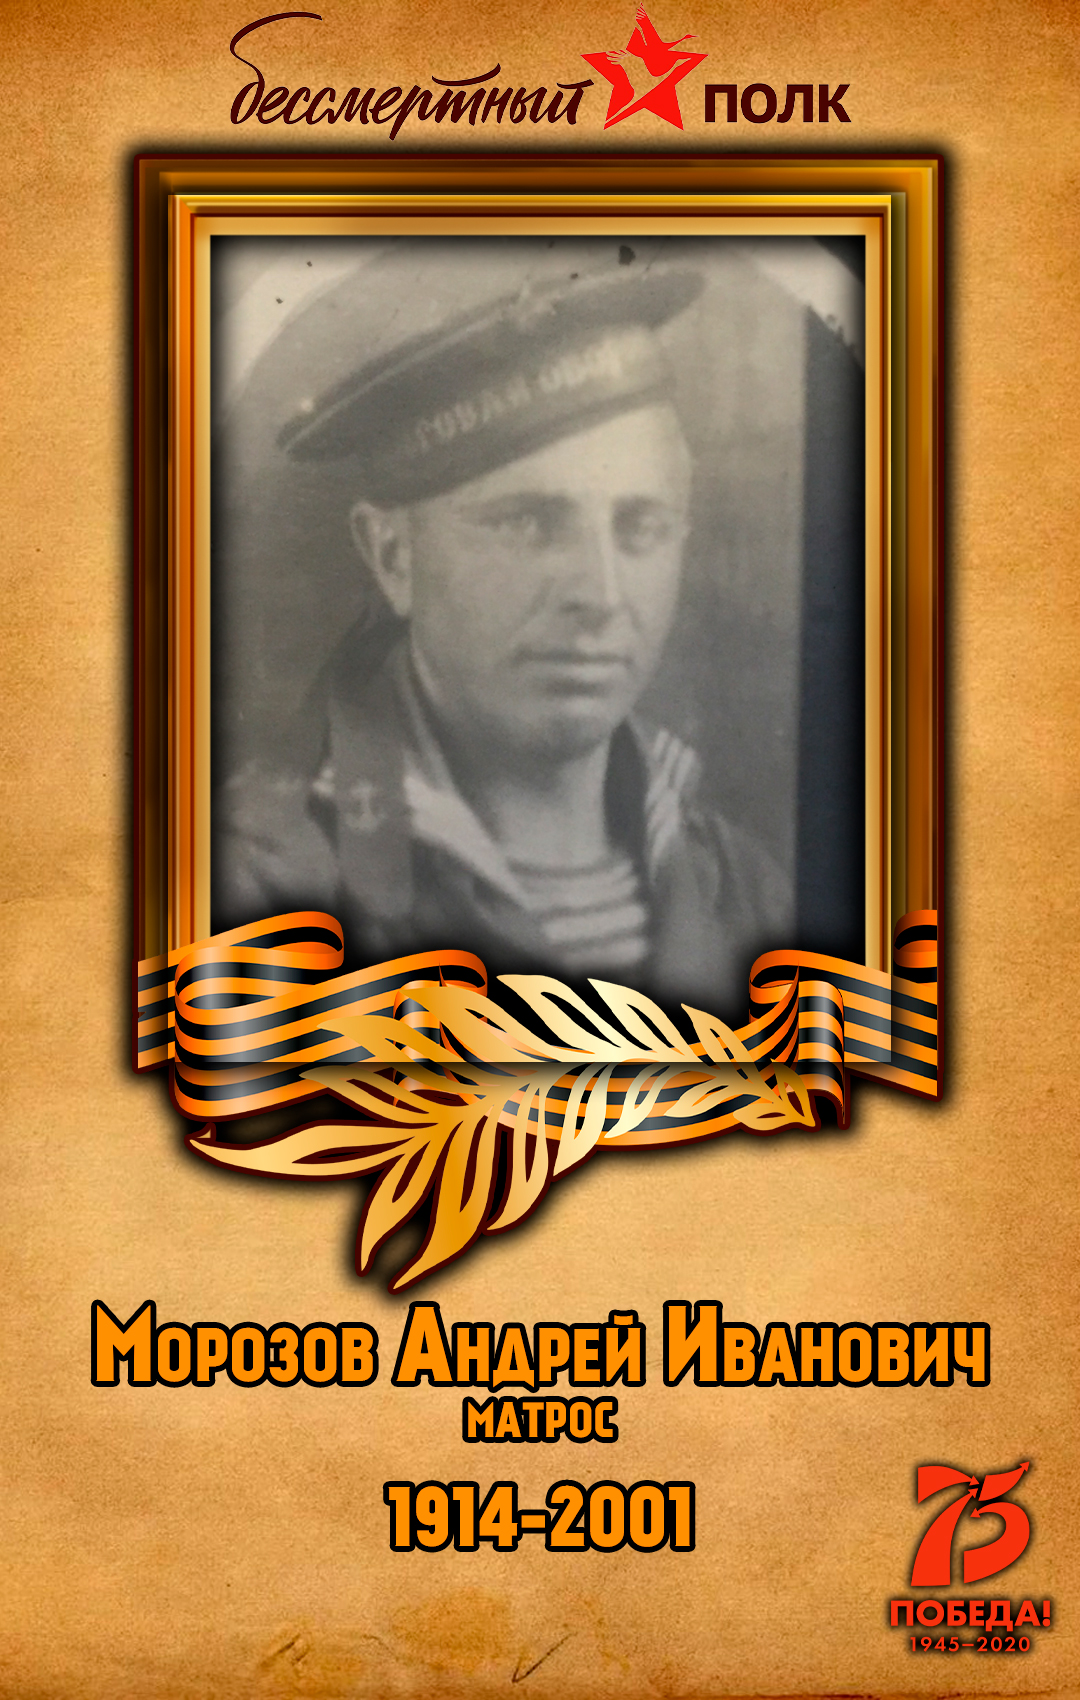 Морозов-Андрей-Иванович